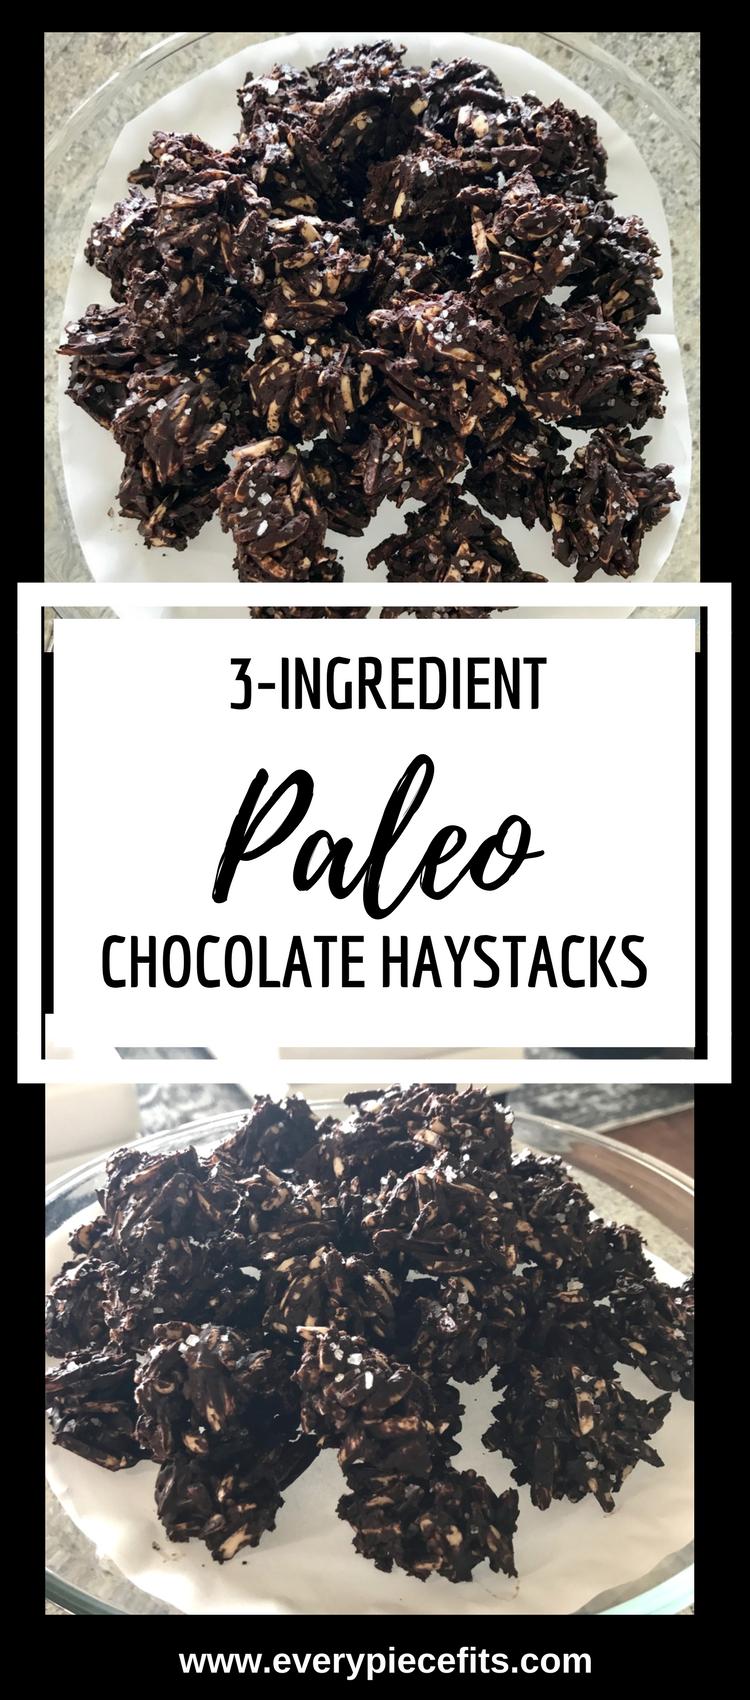 Pinterest Paleo Chocolate Haystacks.png